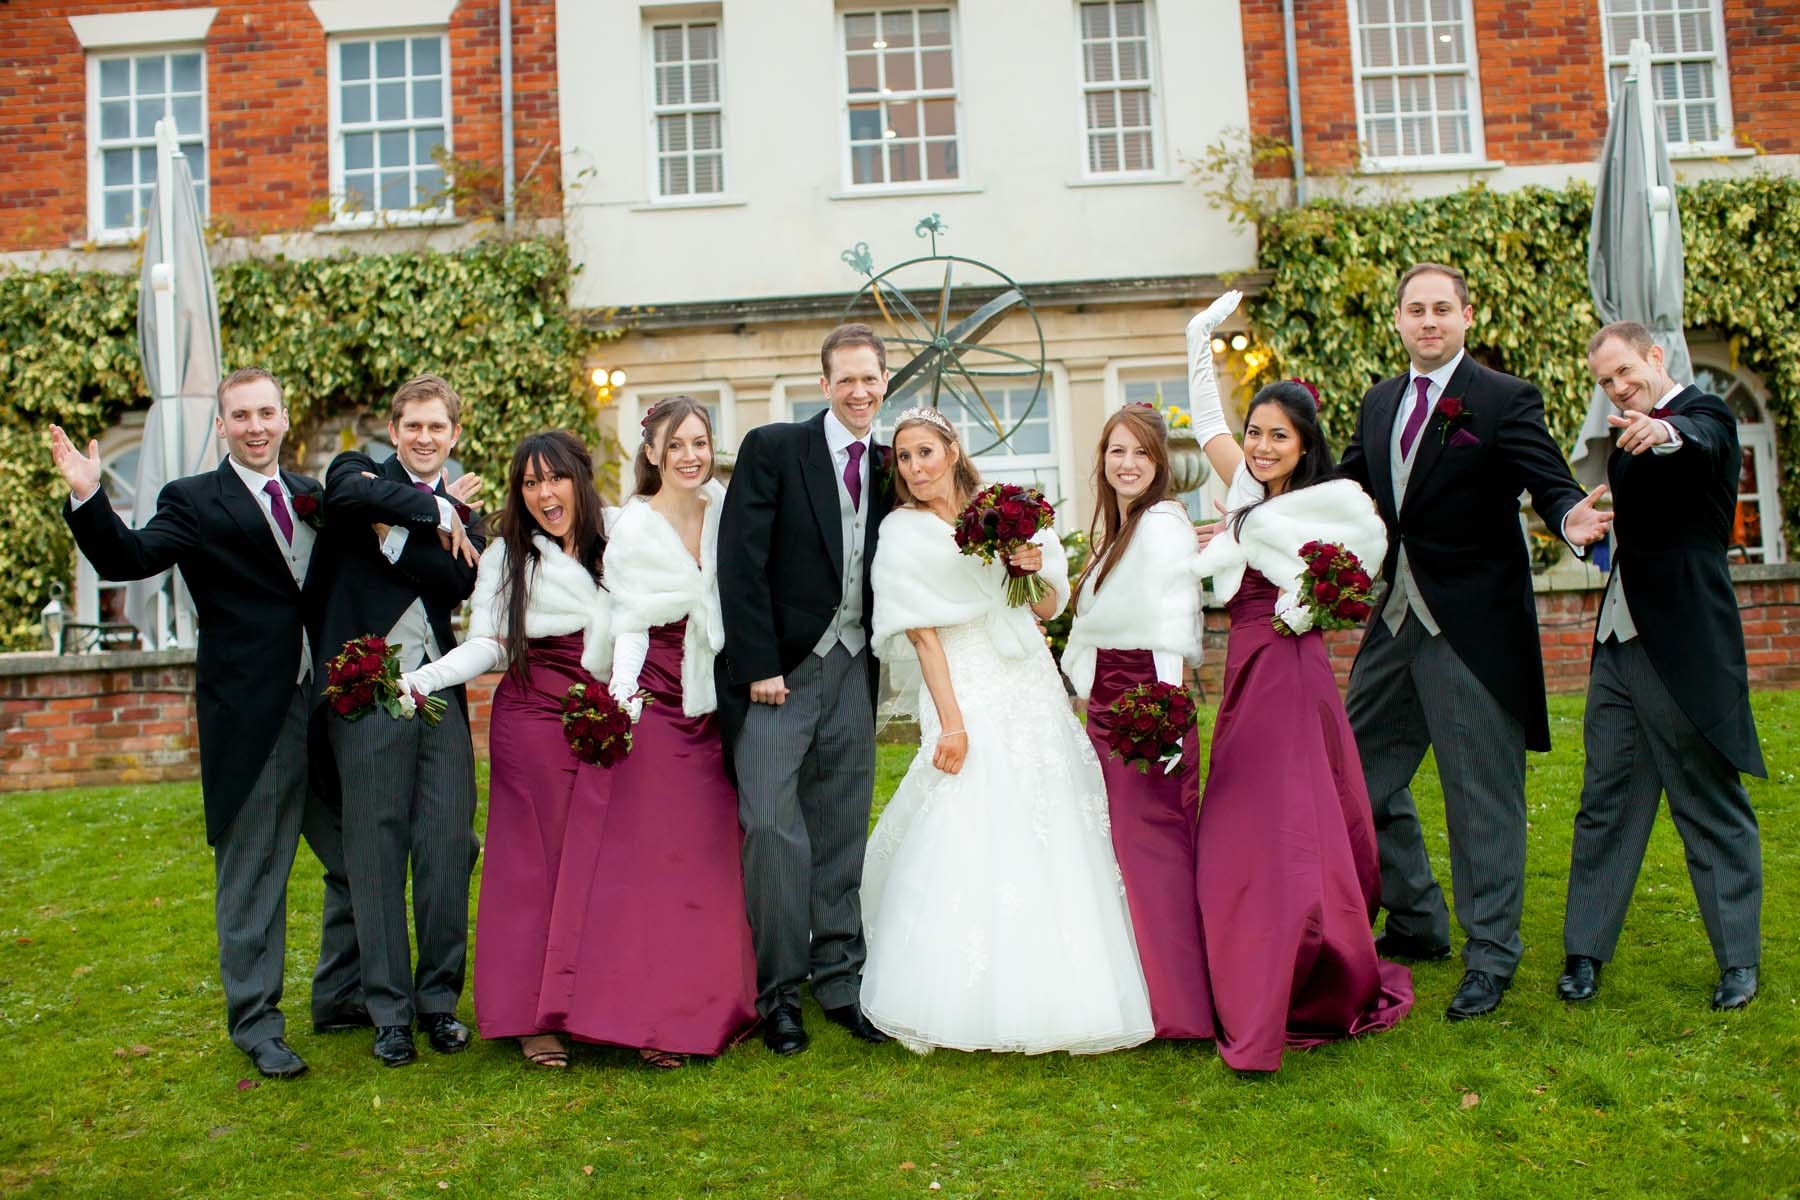 Sussex & Surrey Wedding Photographer - Guests & Groups (18)